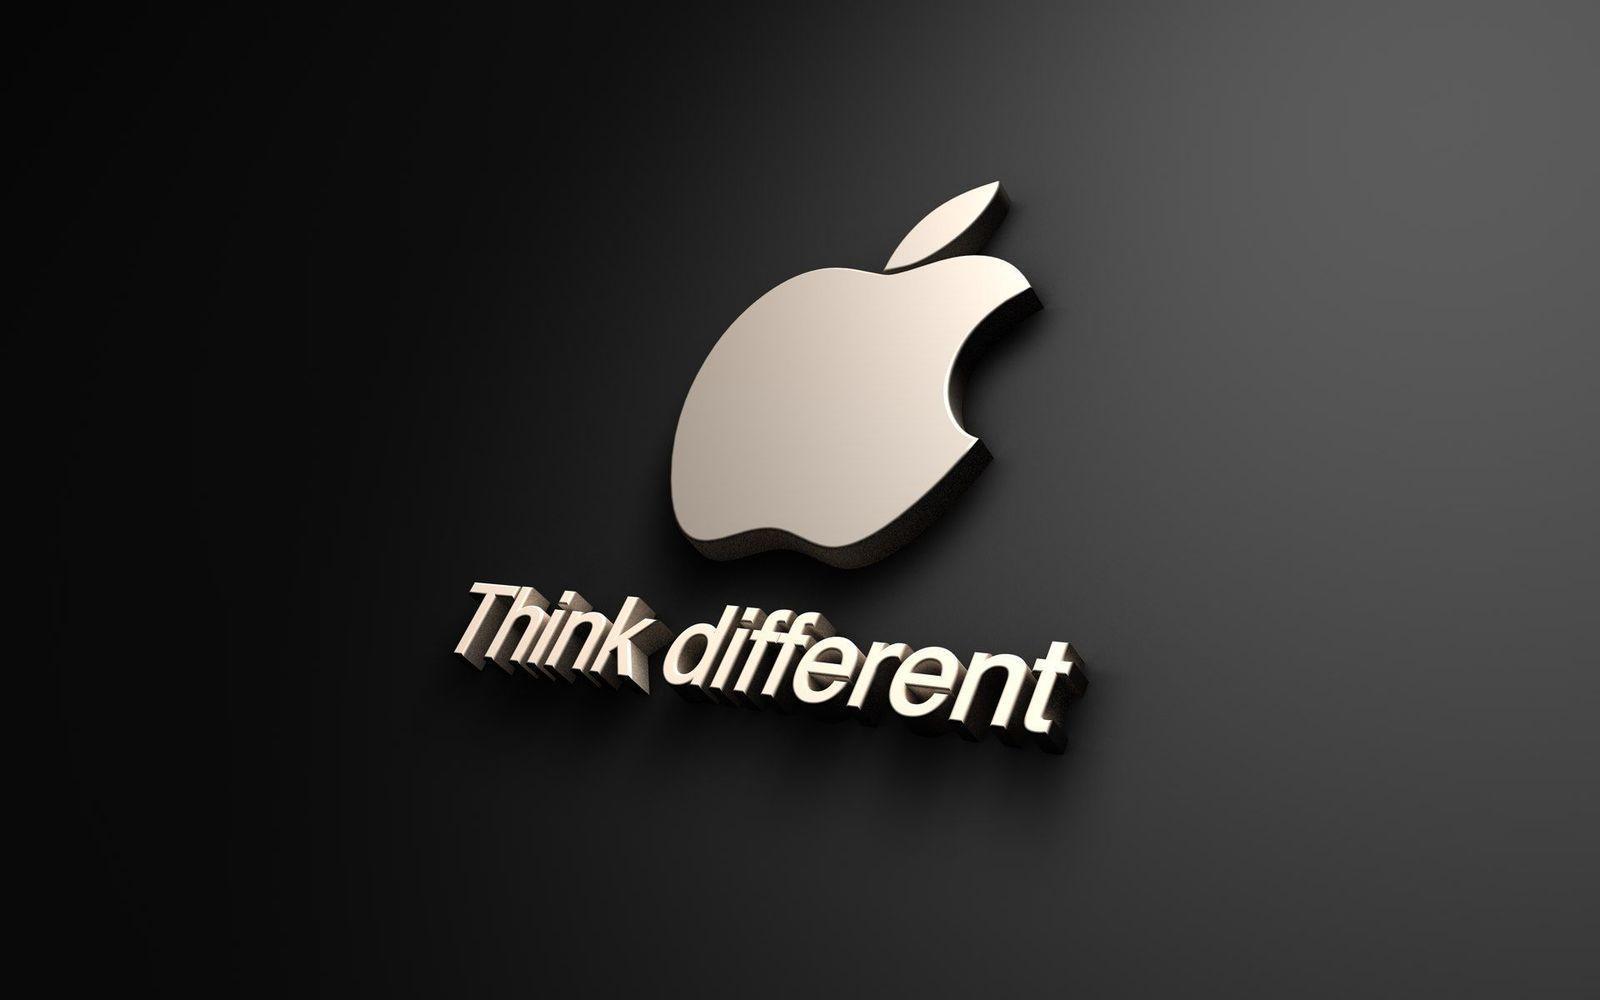 اپل آیفون ۸